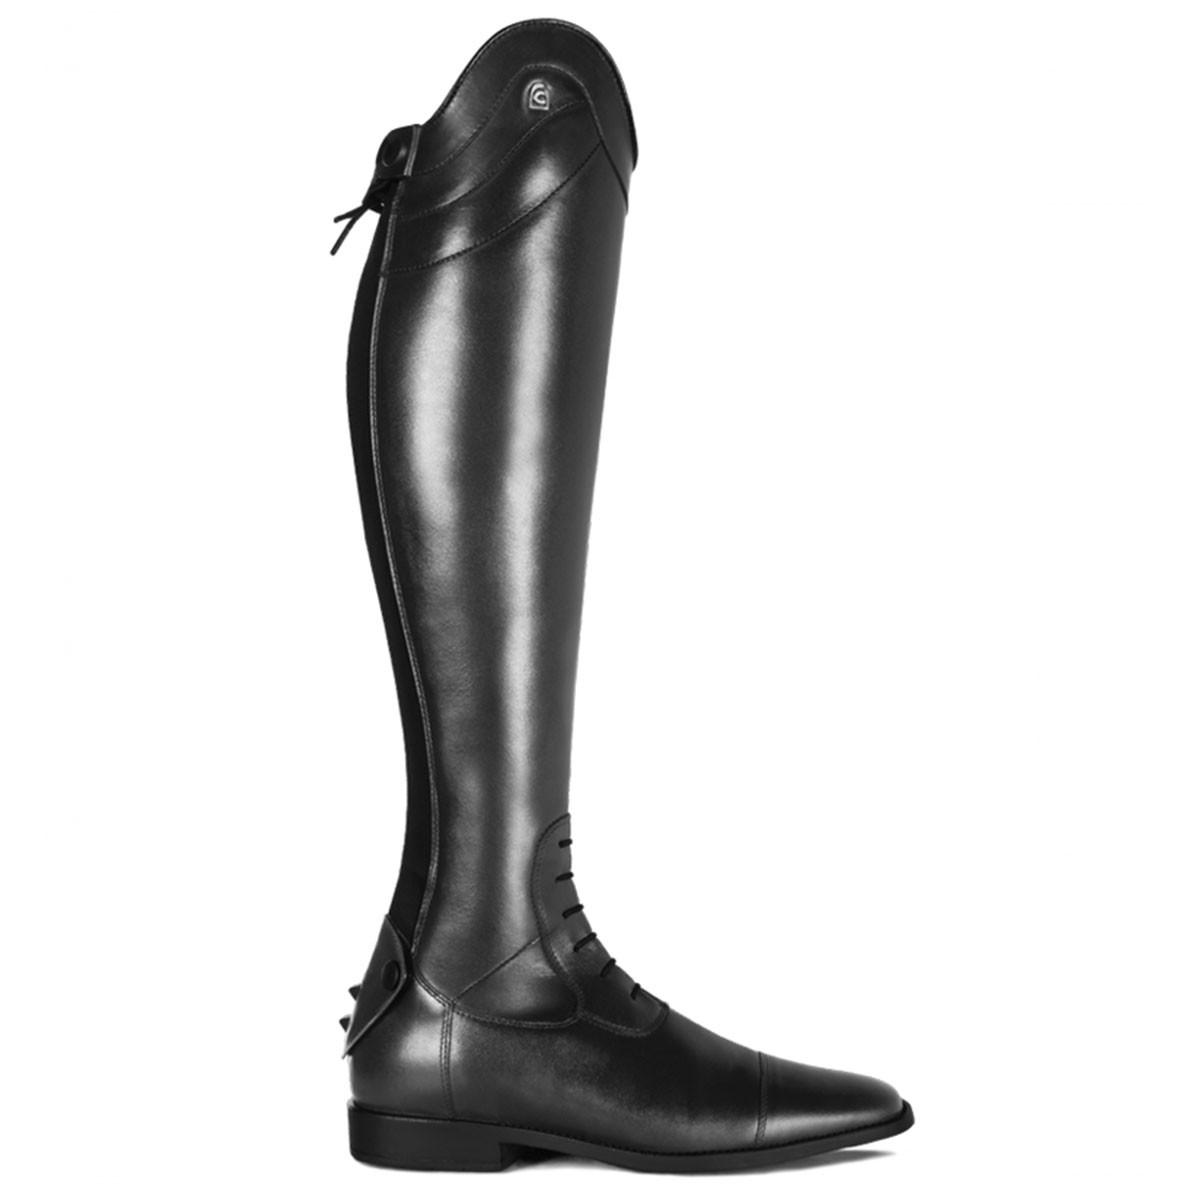 Cavallo Linus Slim rijlaars zwart maat:7-7.5 / h49-w35